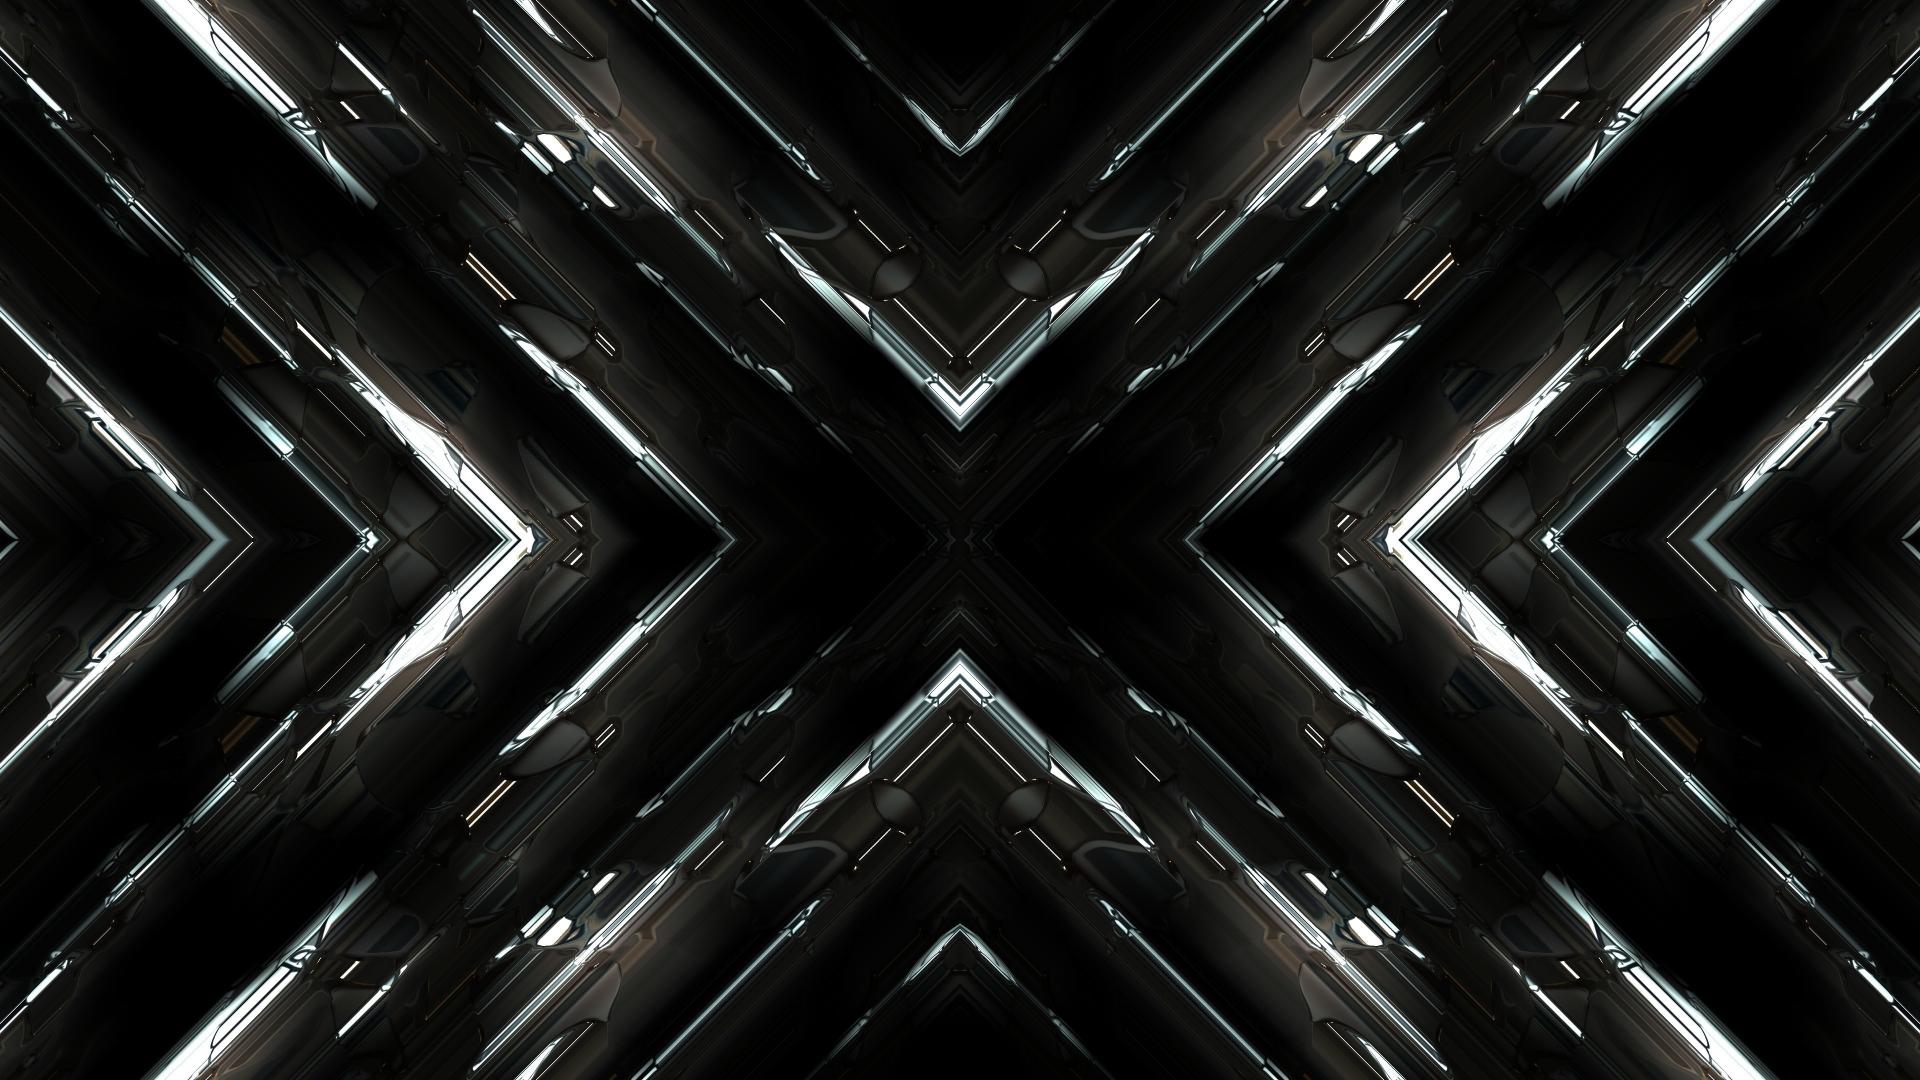 Download 1920x1080 wallpaper fractal, dark, abstract, full ...